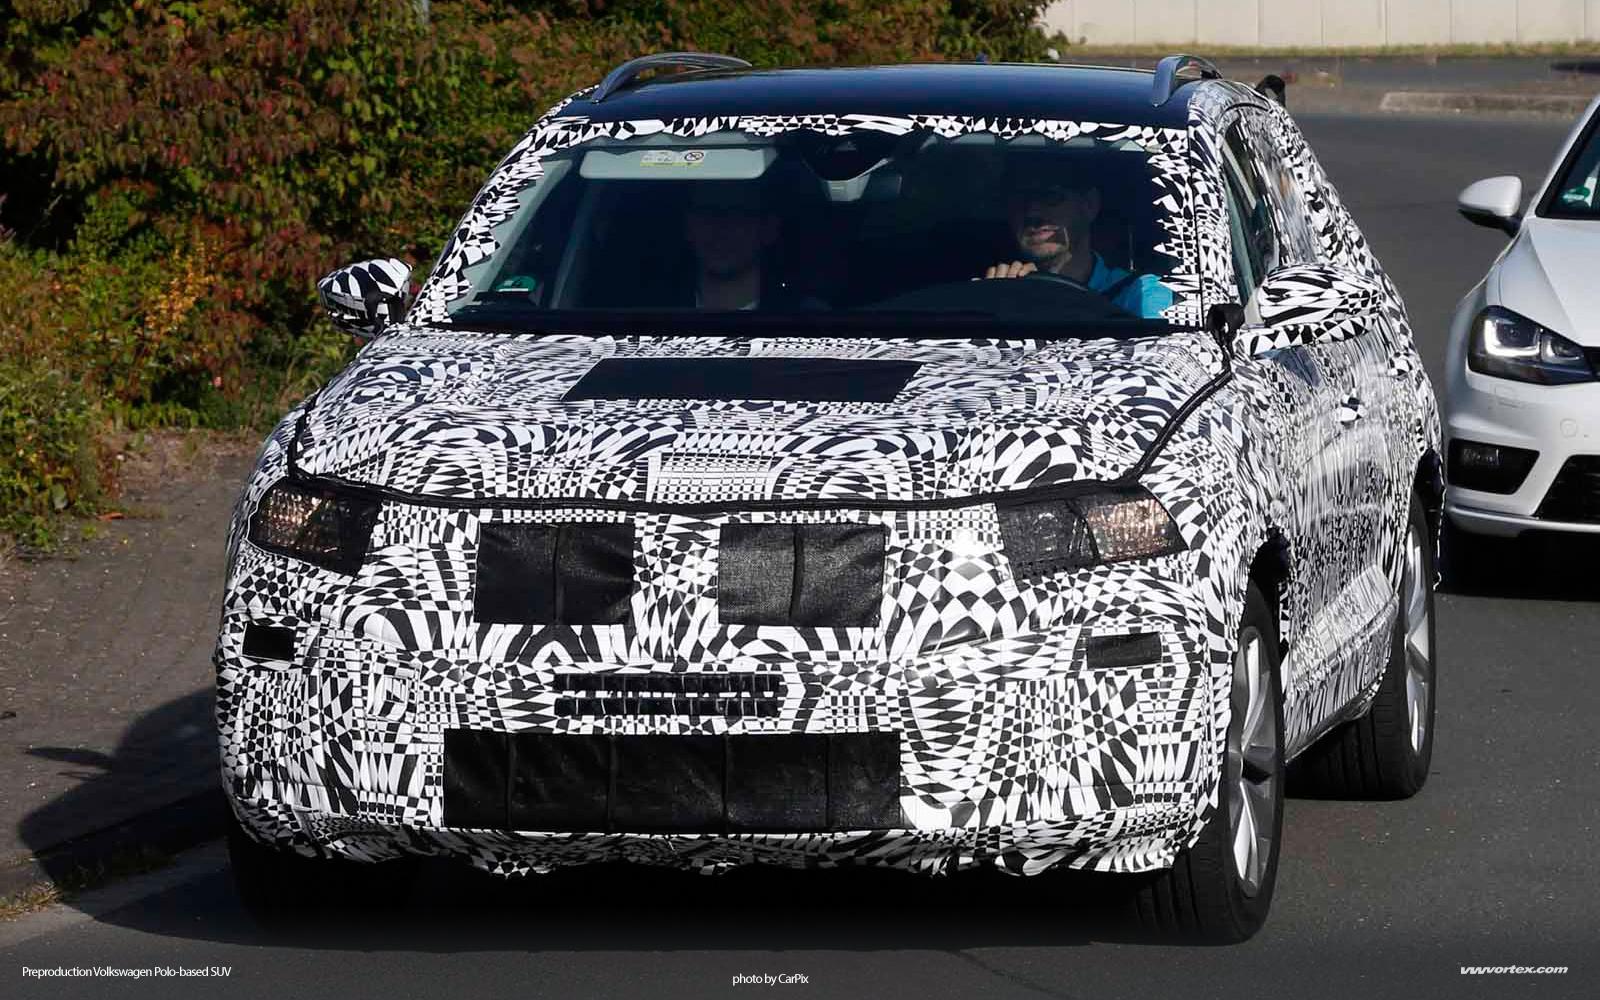 2015 VLN Audi R8 LMS test and setup session 963 110x60 photo